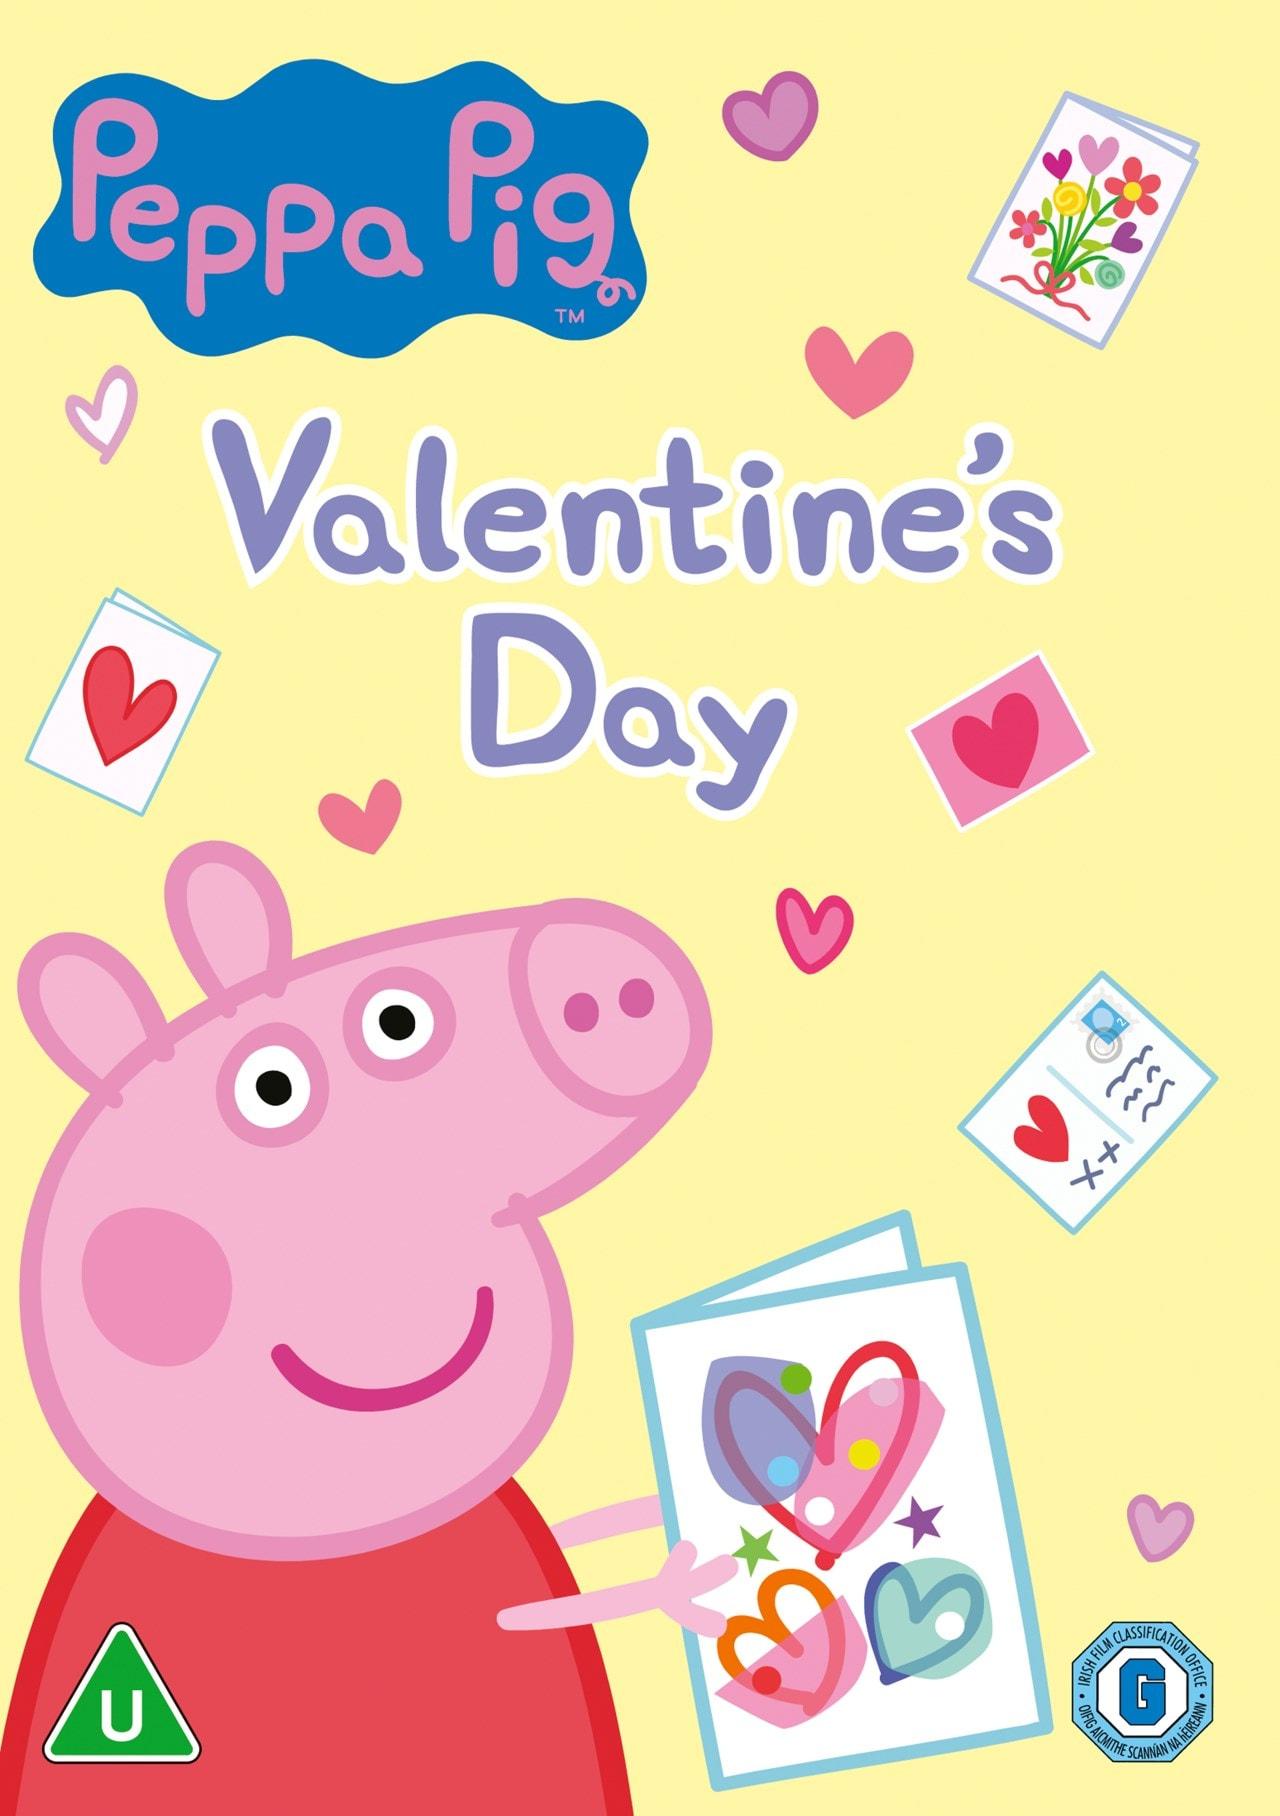 Peppa Pig: Valentine's Day - 1